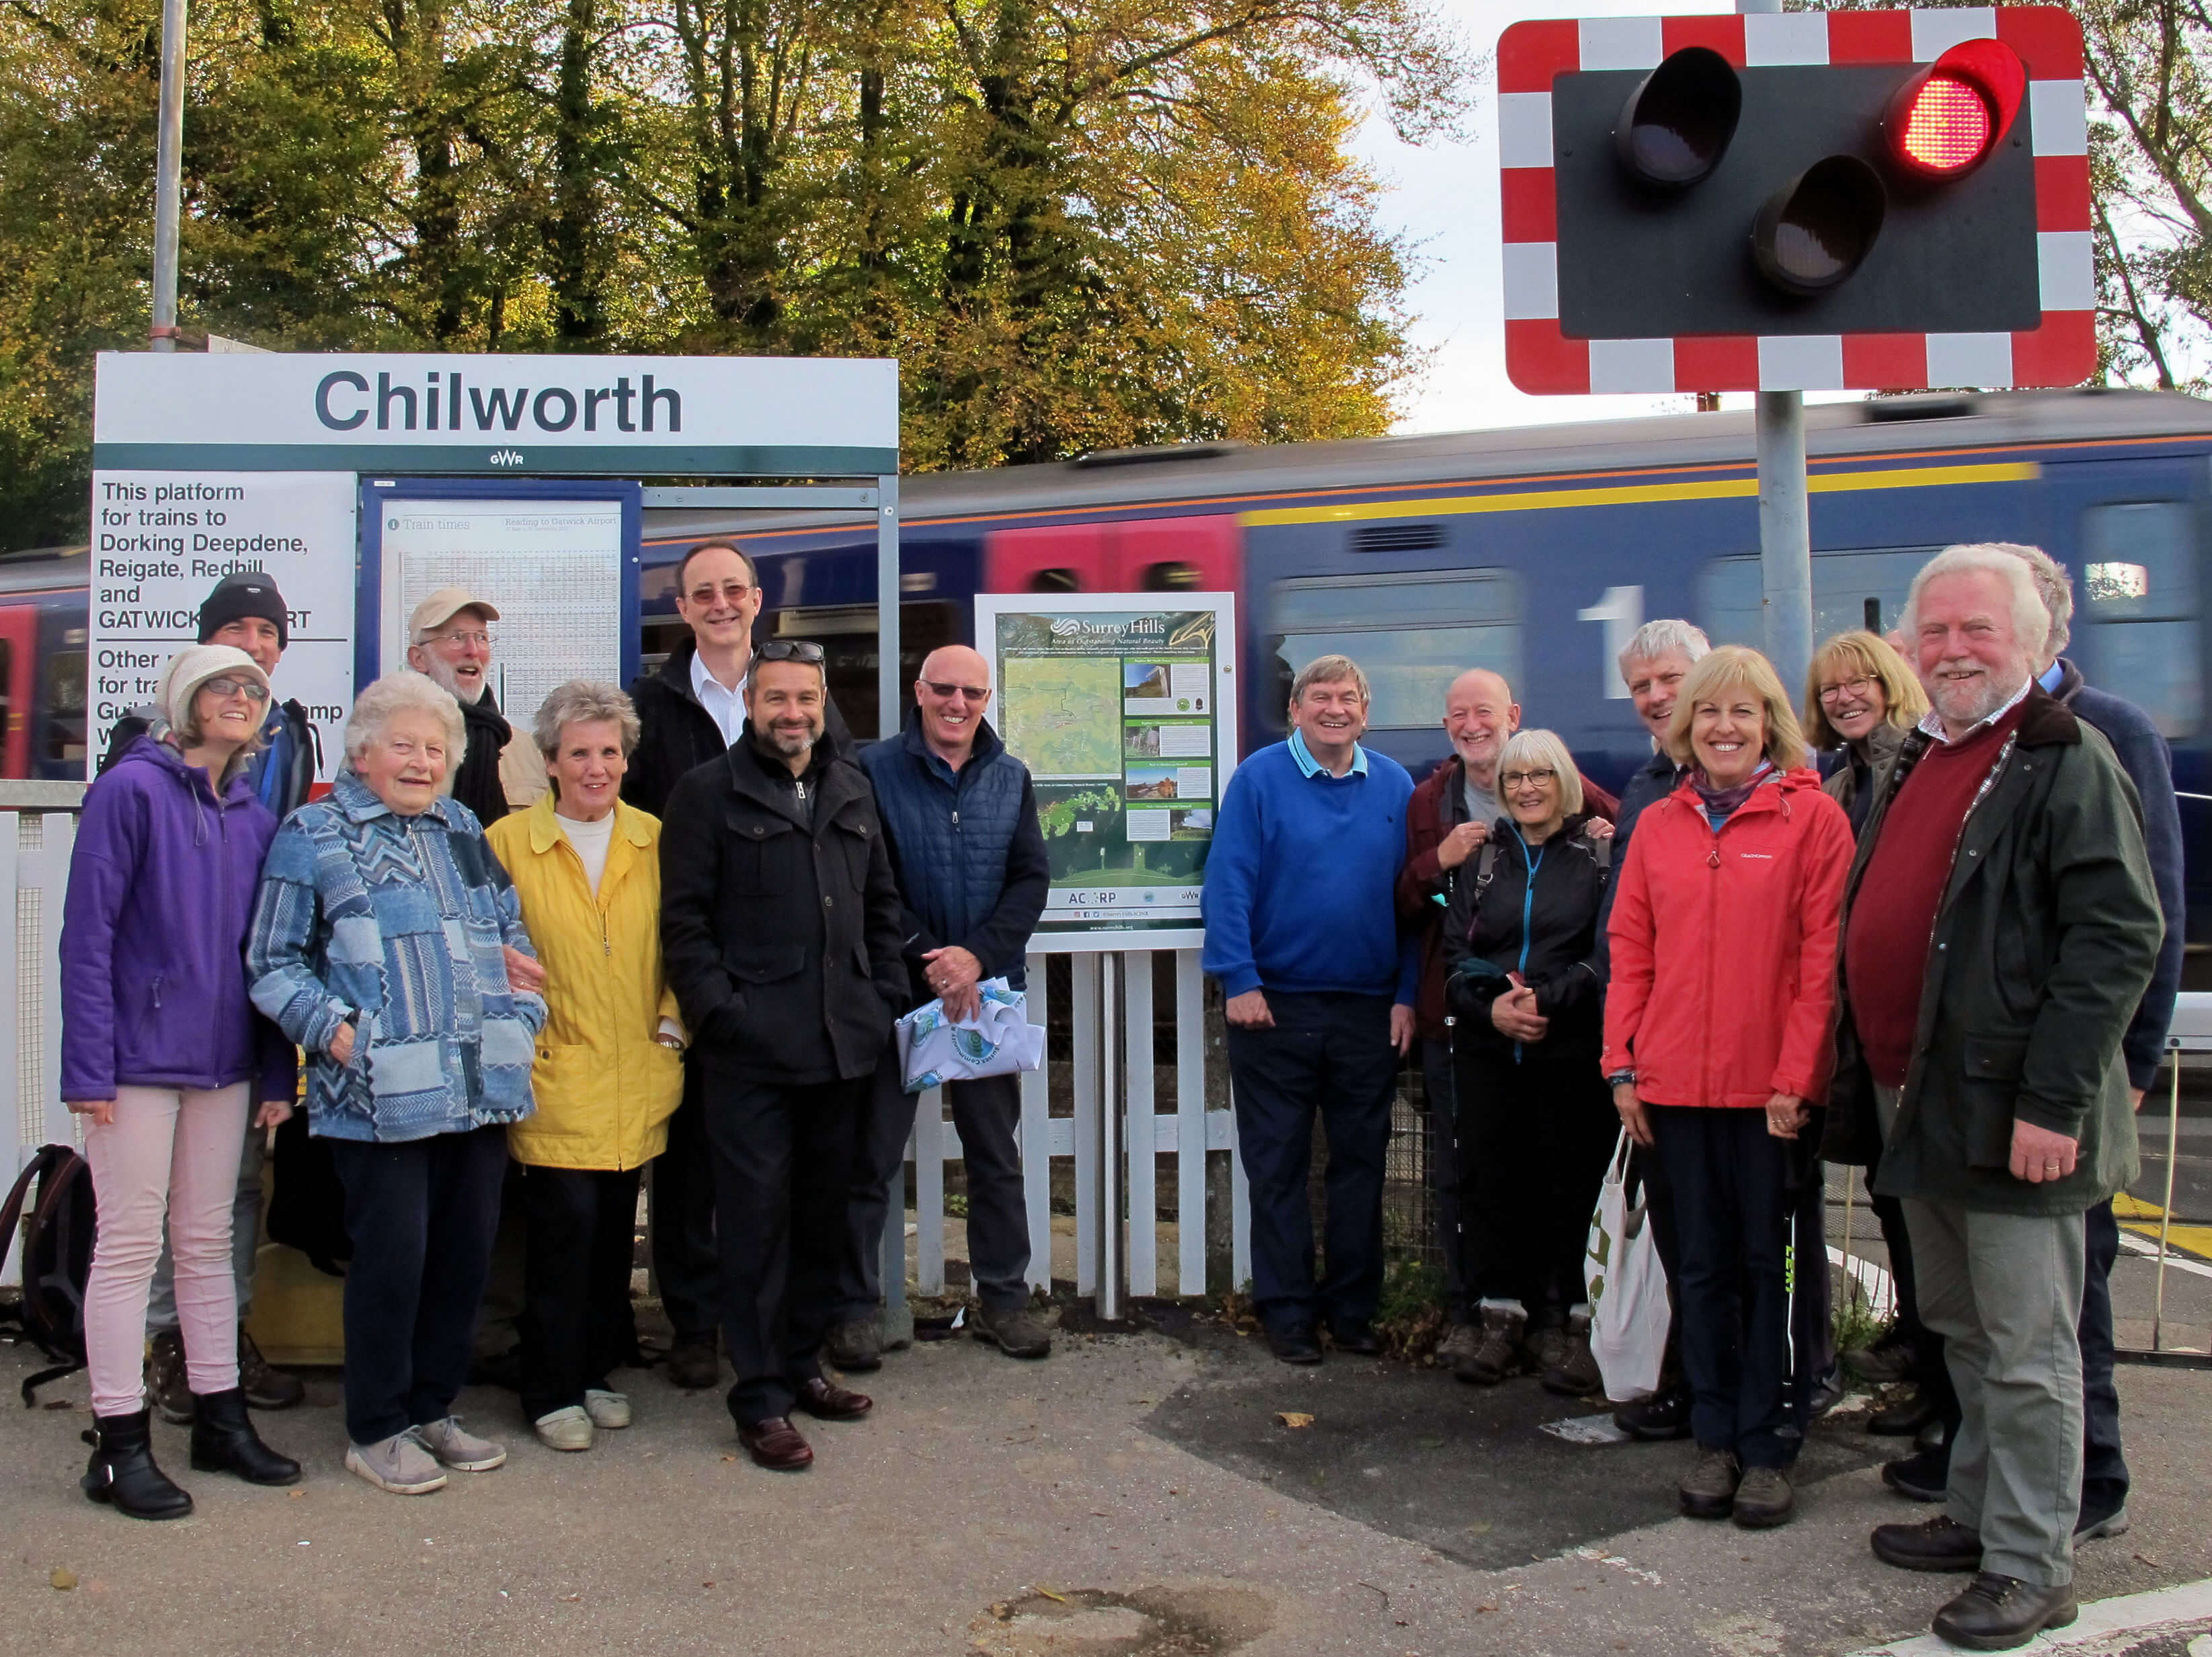 North Downs Way signage Chilworth